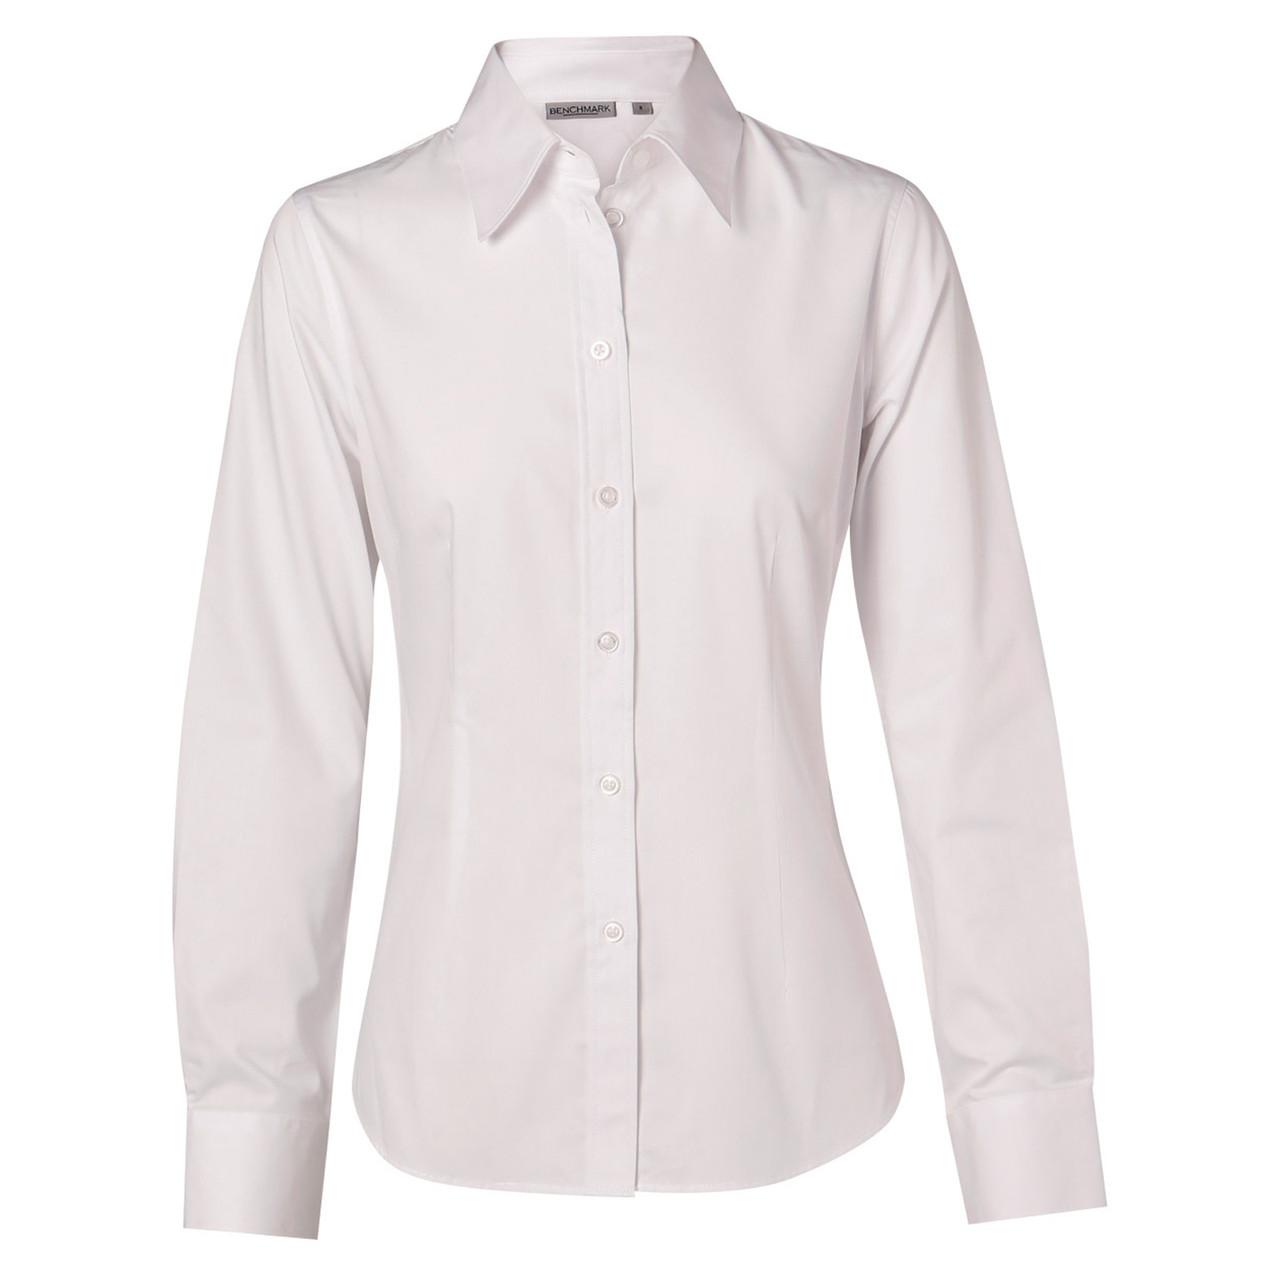 Benchmark Ladies/' Cotton Poly Stretch Long Sleeve Shirt Single Button SquareCuff